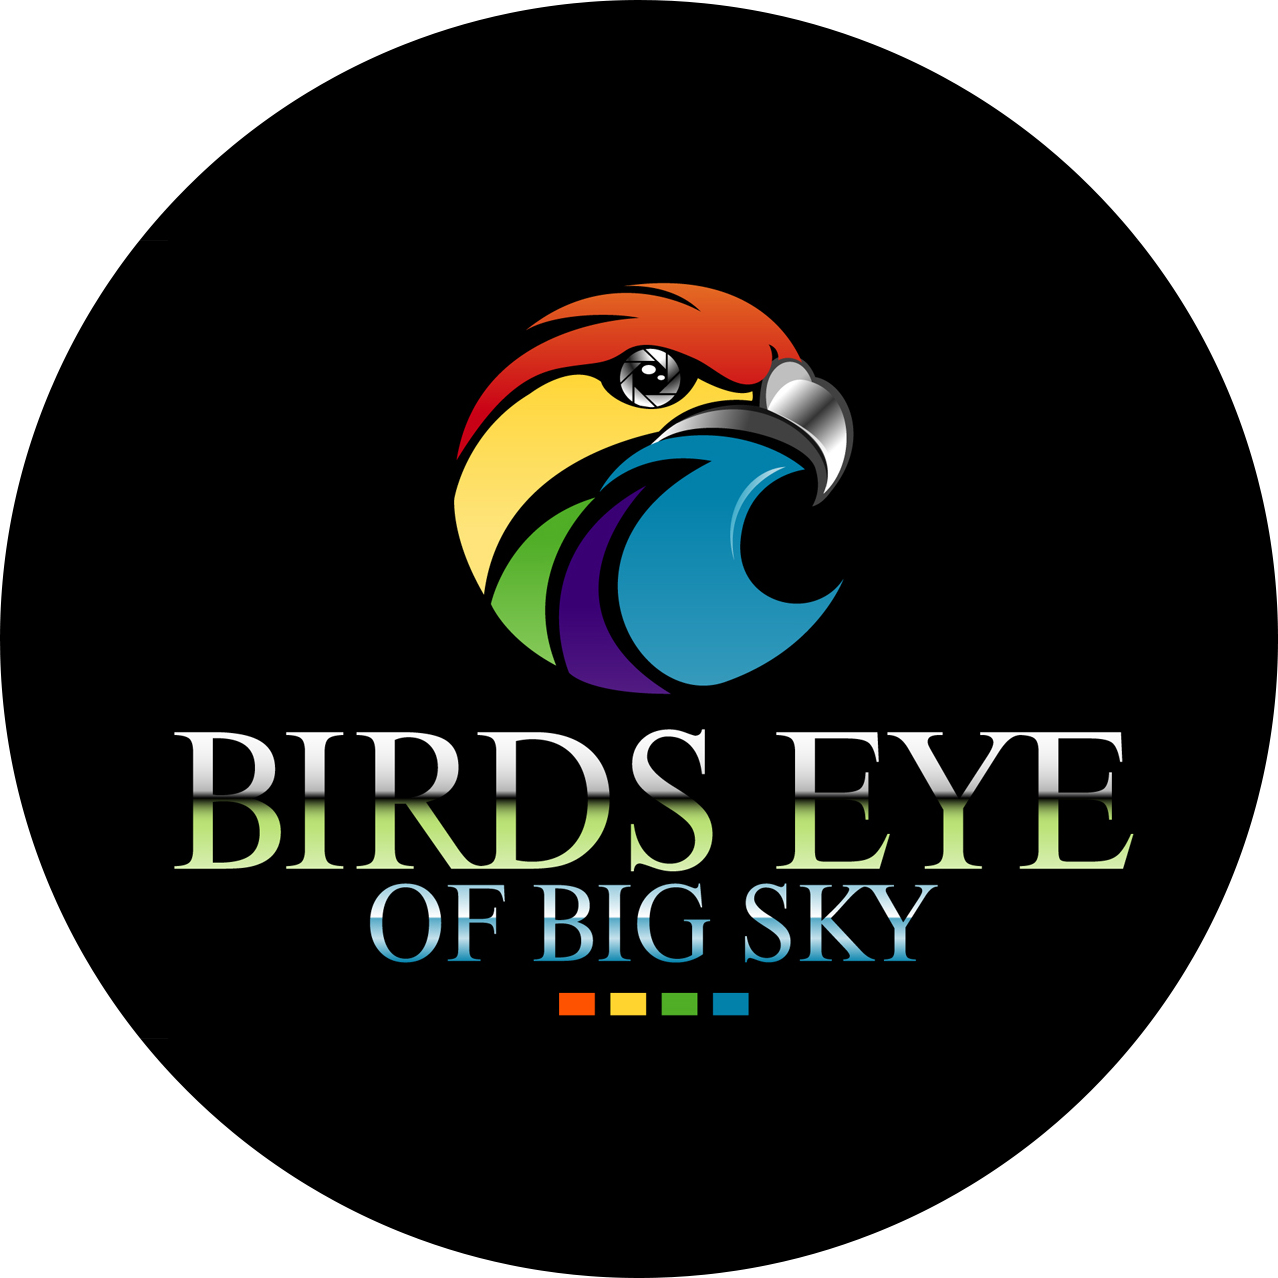 BirdsEyeofBigSkyDroneCompanyAerialPhotography